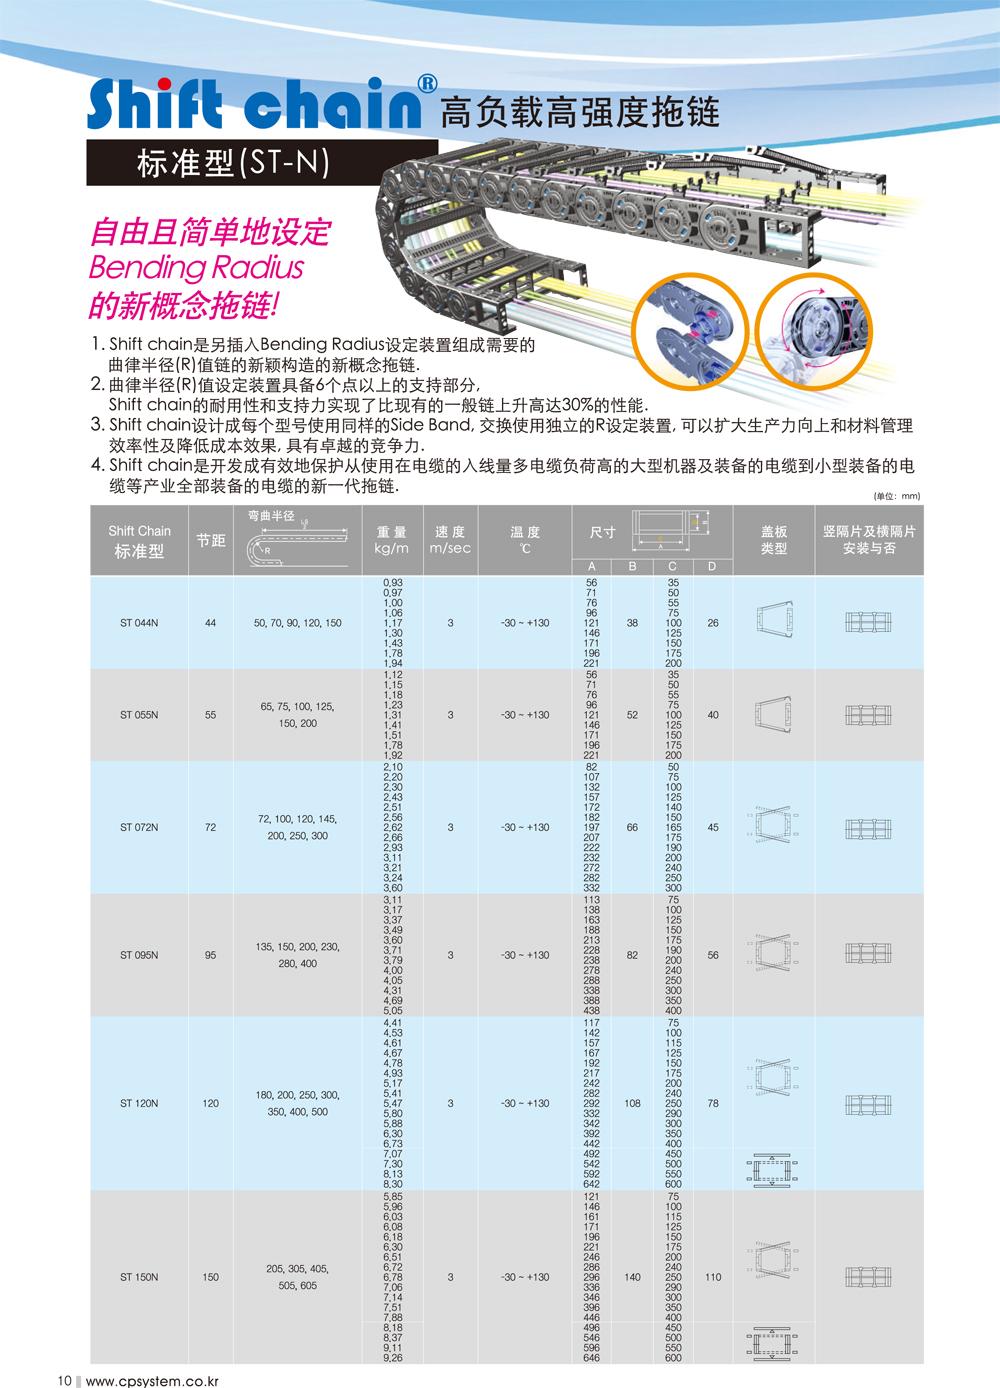 WWW_8288CPS_COM_cps 高负载高强度标准型拖链 st-n 韩国进口